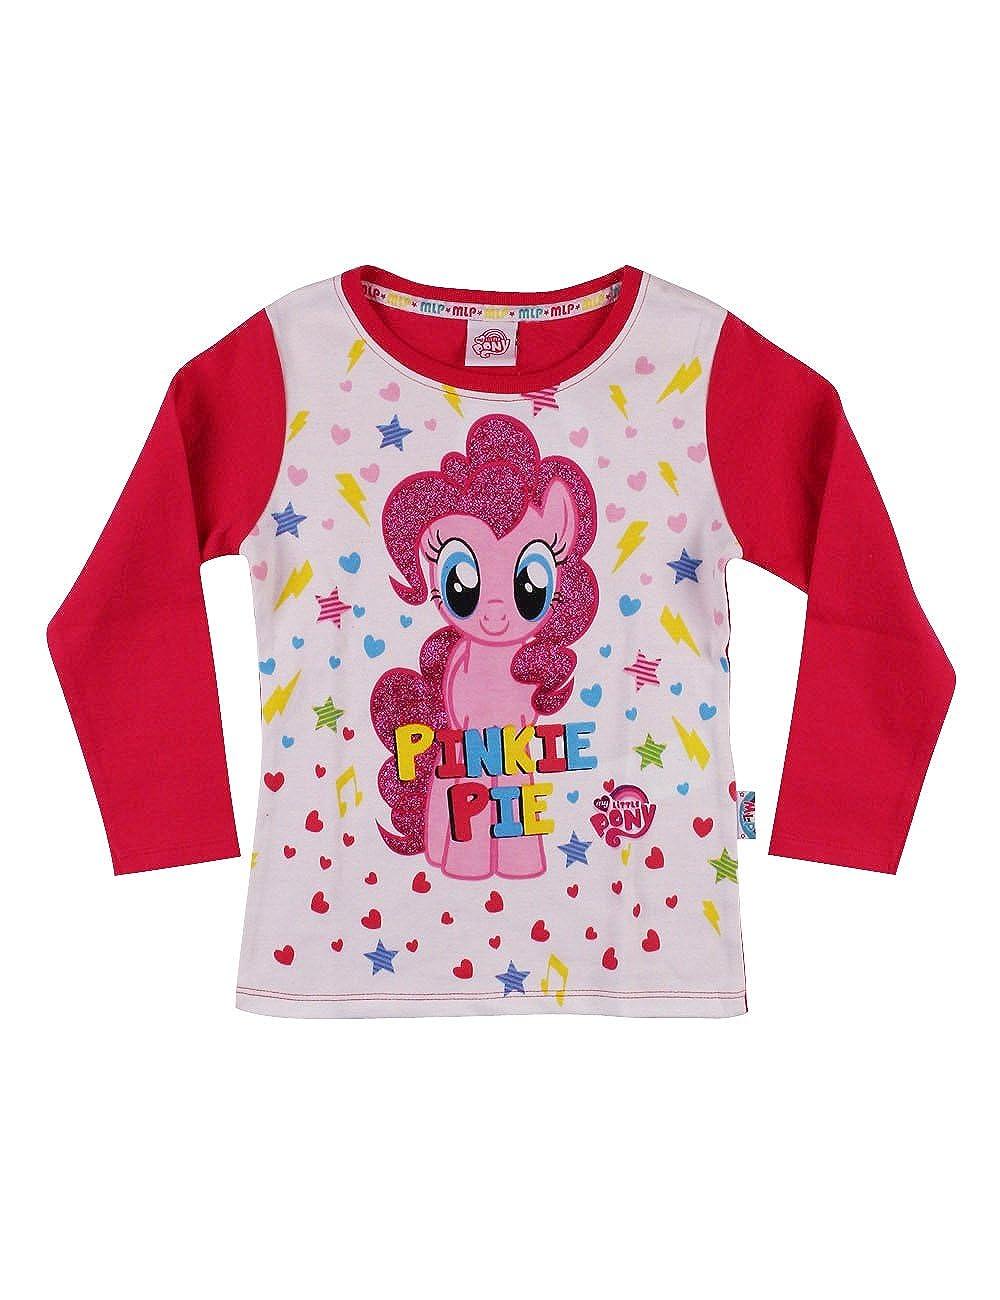 Hasbro T-Shirt Manica Lunga My Little Pony Pinkie Pie Bambina